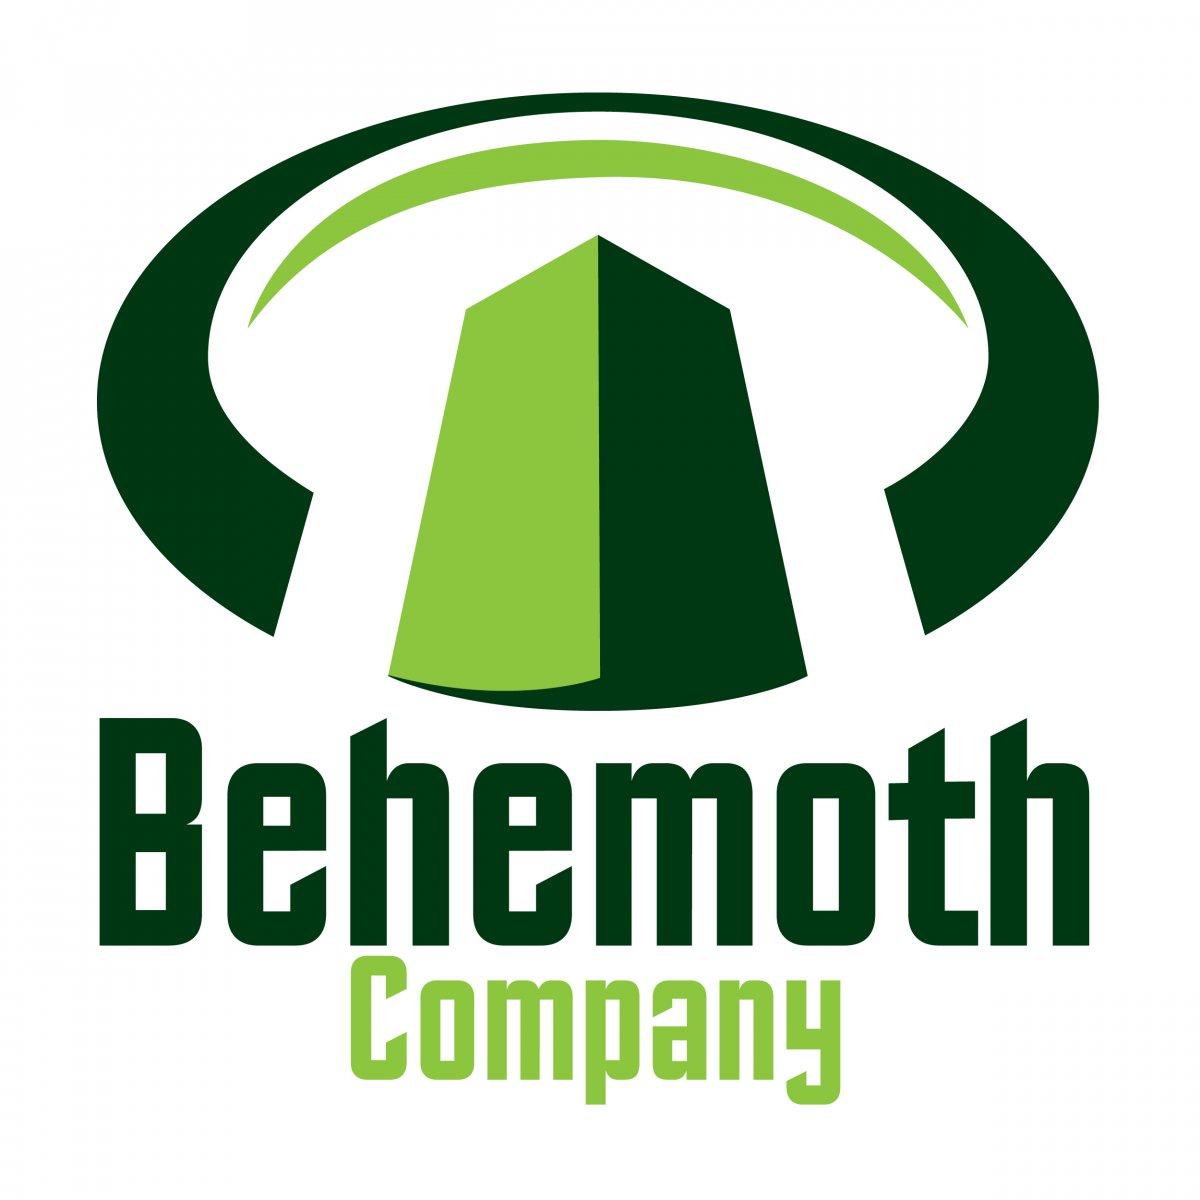 Behemoth Company logo